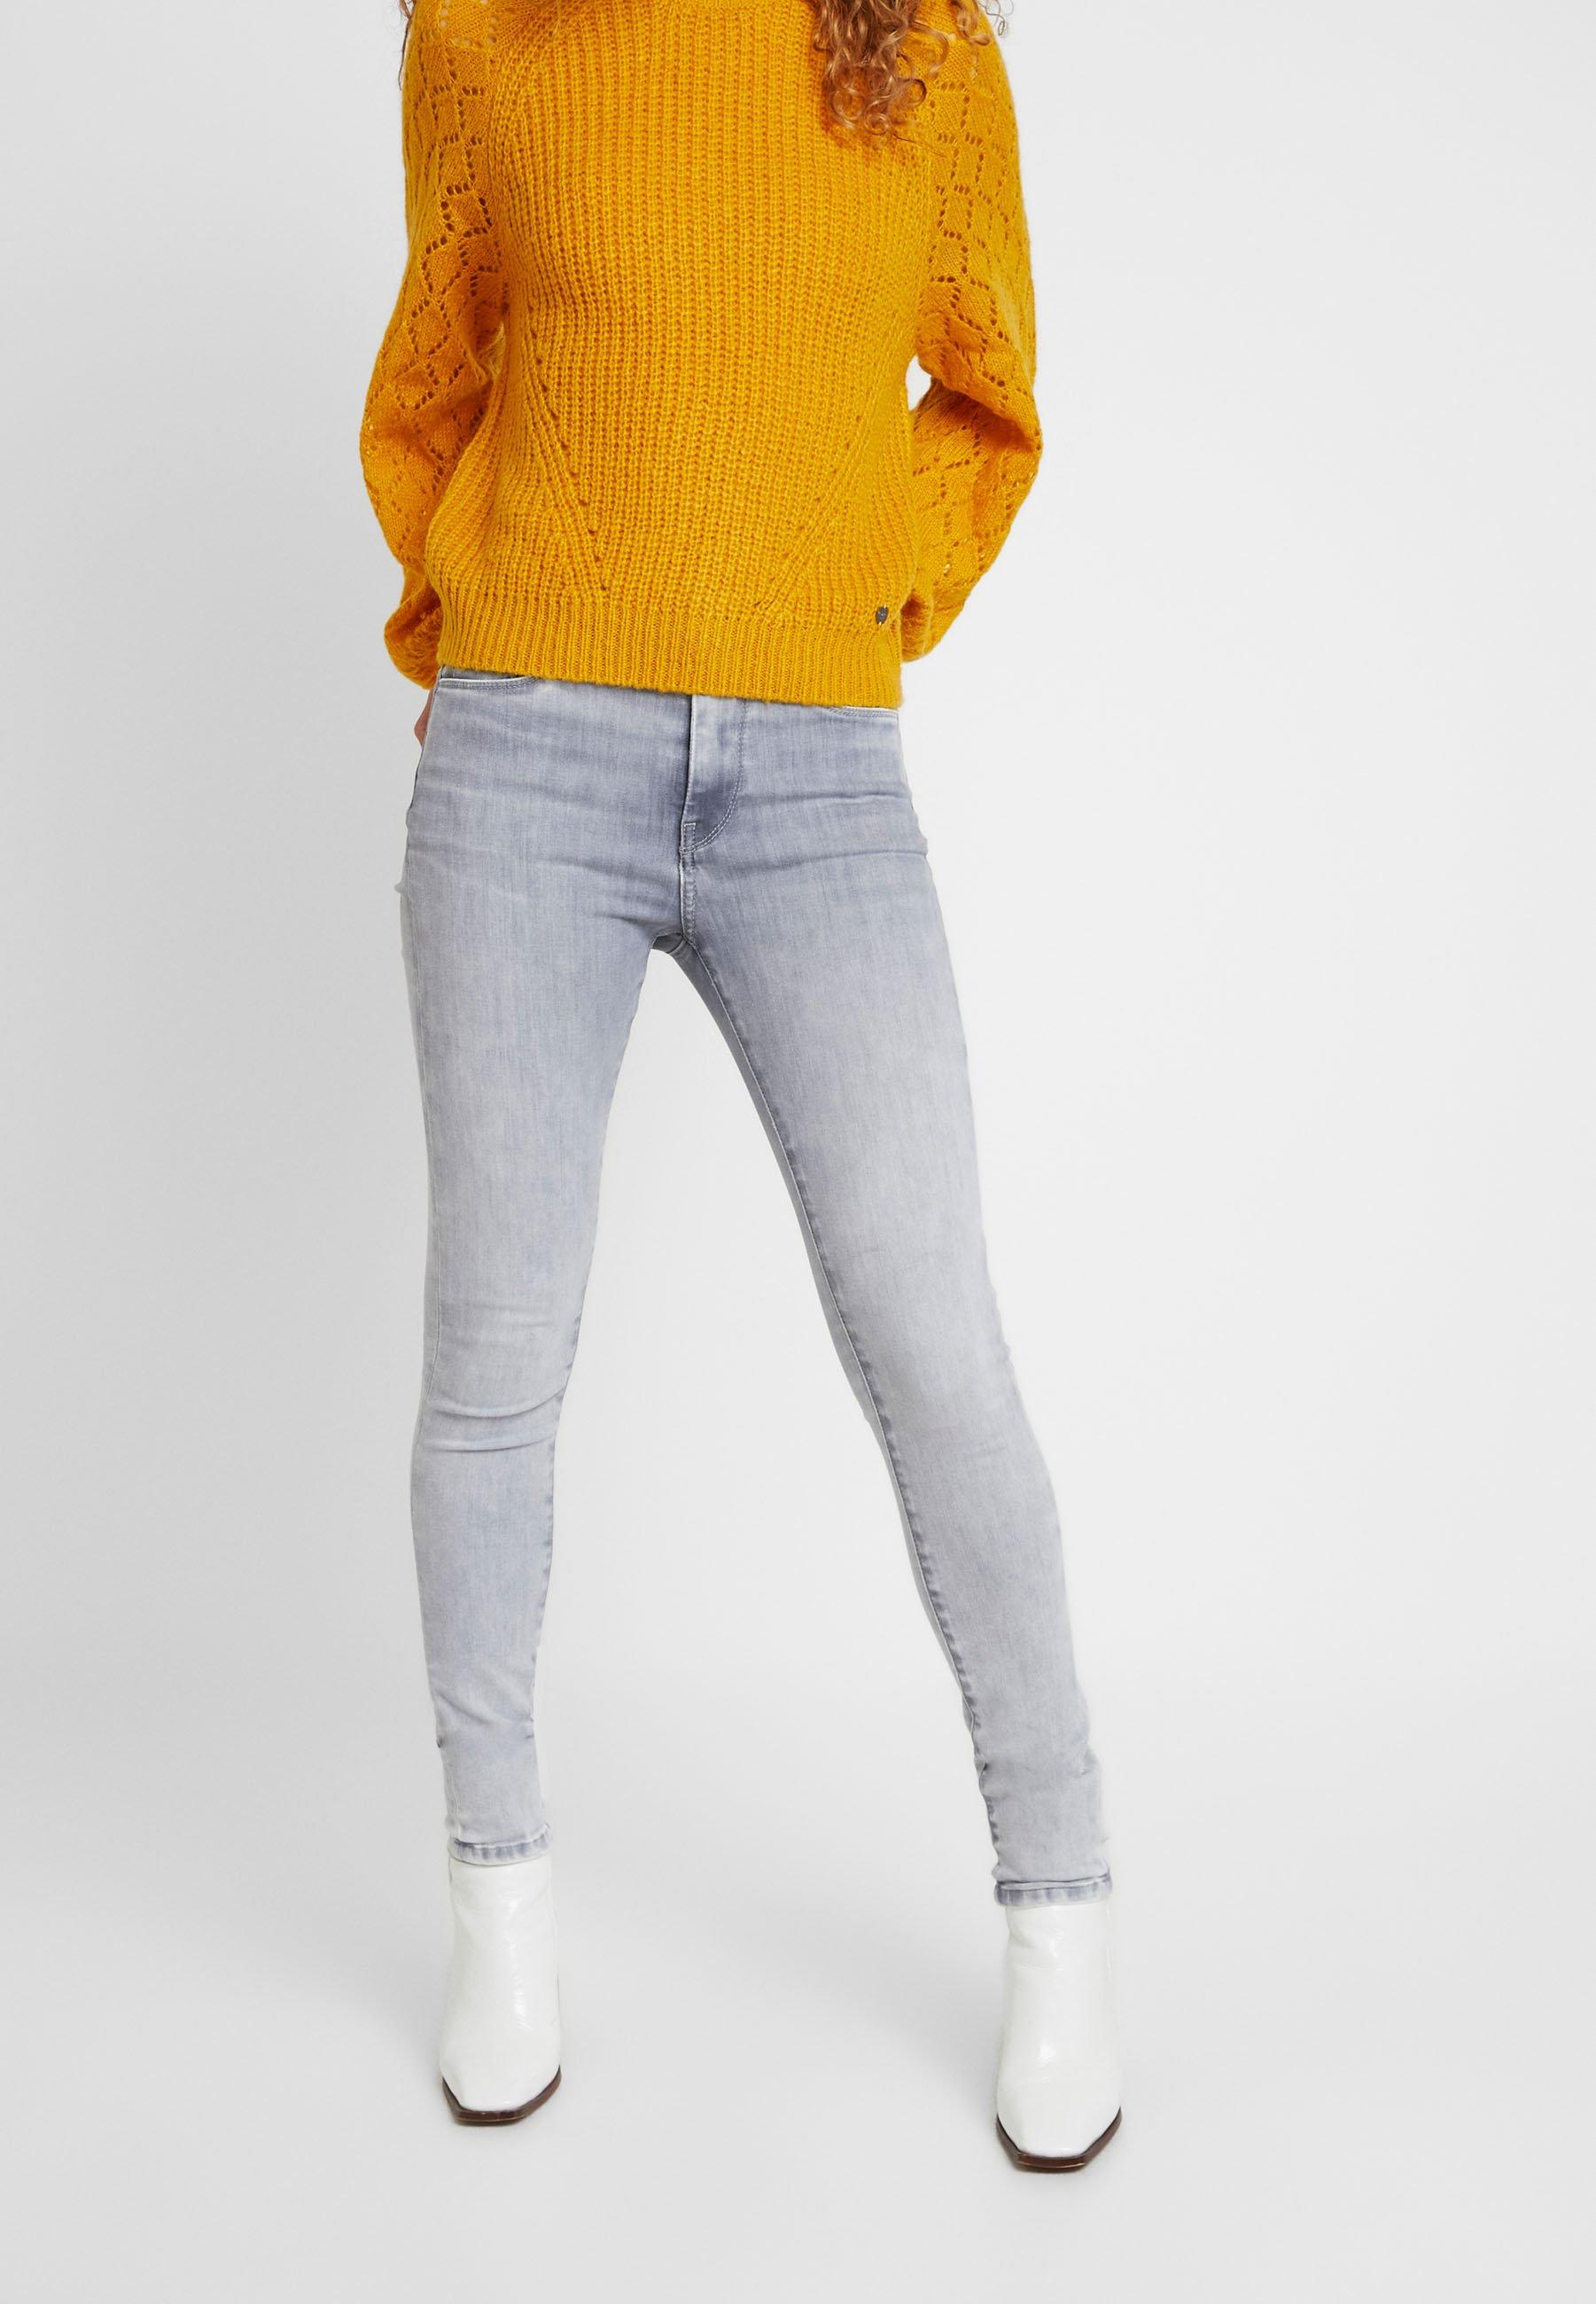 Pepe Jeans SkinnyDenim SkinnyDenim Jeans Jeans SkinnyDenim Pepe Jeans SkinnyDenim Jeans Pepe Pepe SkinnyDenim Pepe Pepe QCodBeExrW